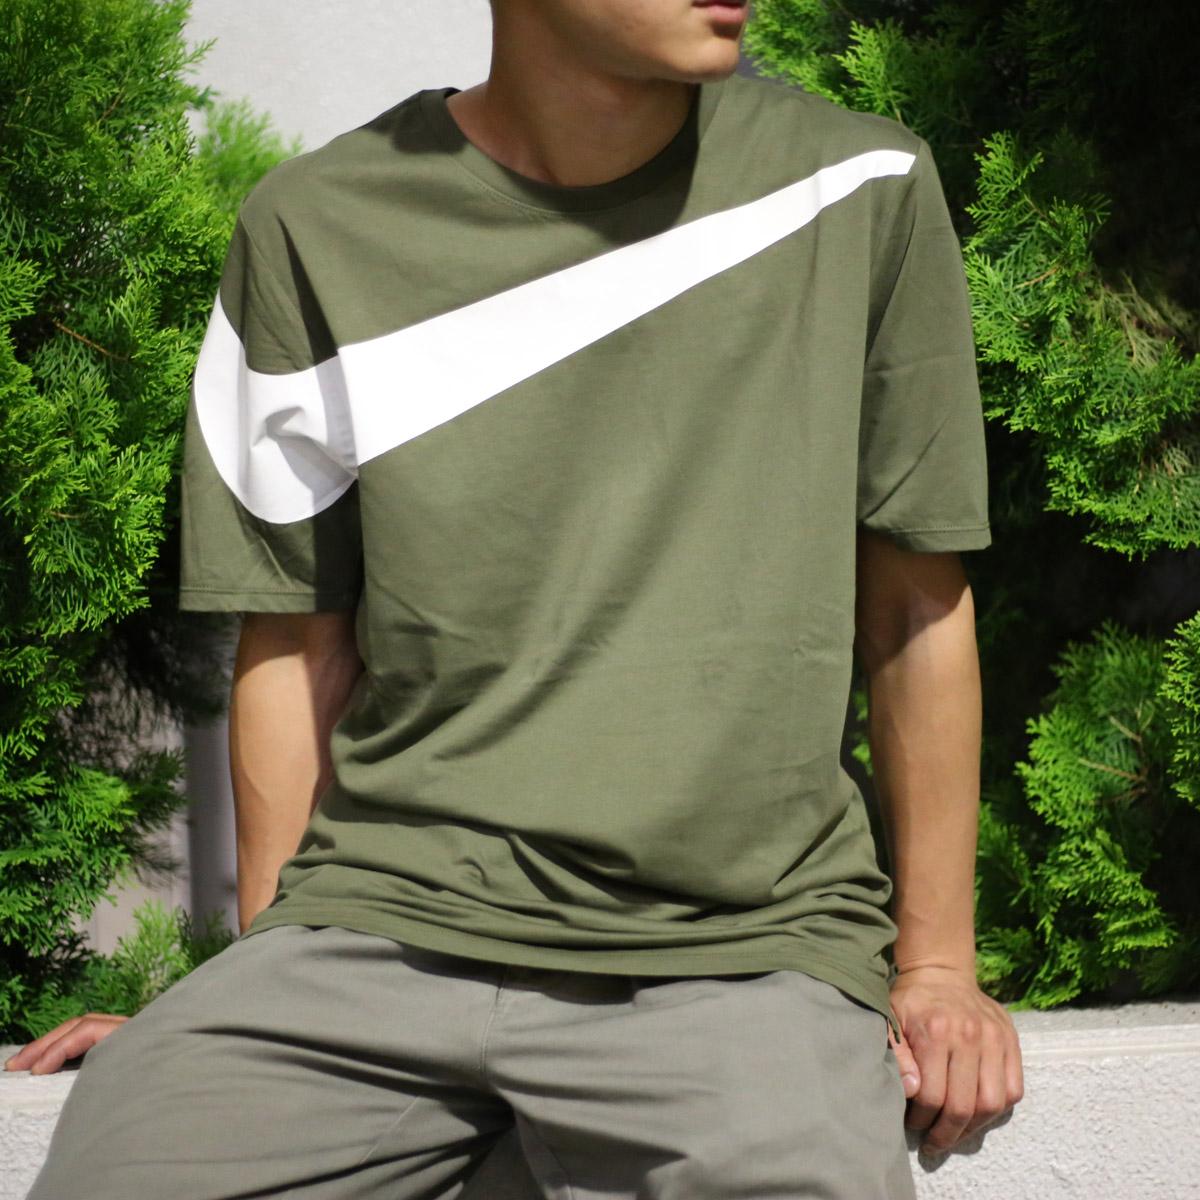 NIKE AS M NSW TEE DRPTL OVRSZ SWSH (ナイキドロップテールオーバーサイズスウッシュ T-shirt) MEDIUM  OLIVE/WHITE 17FA-I